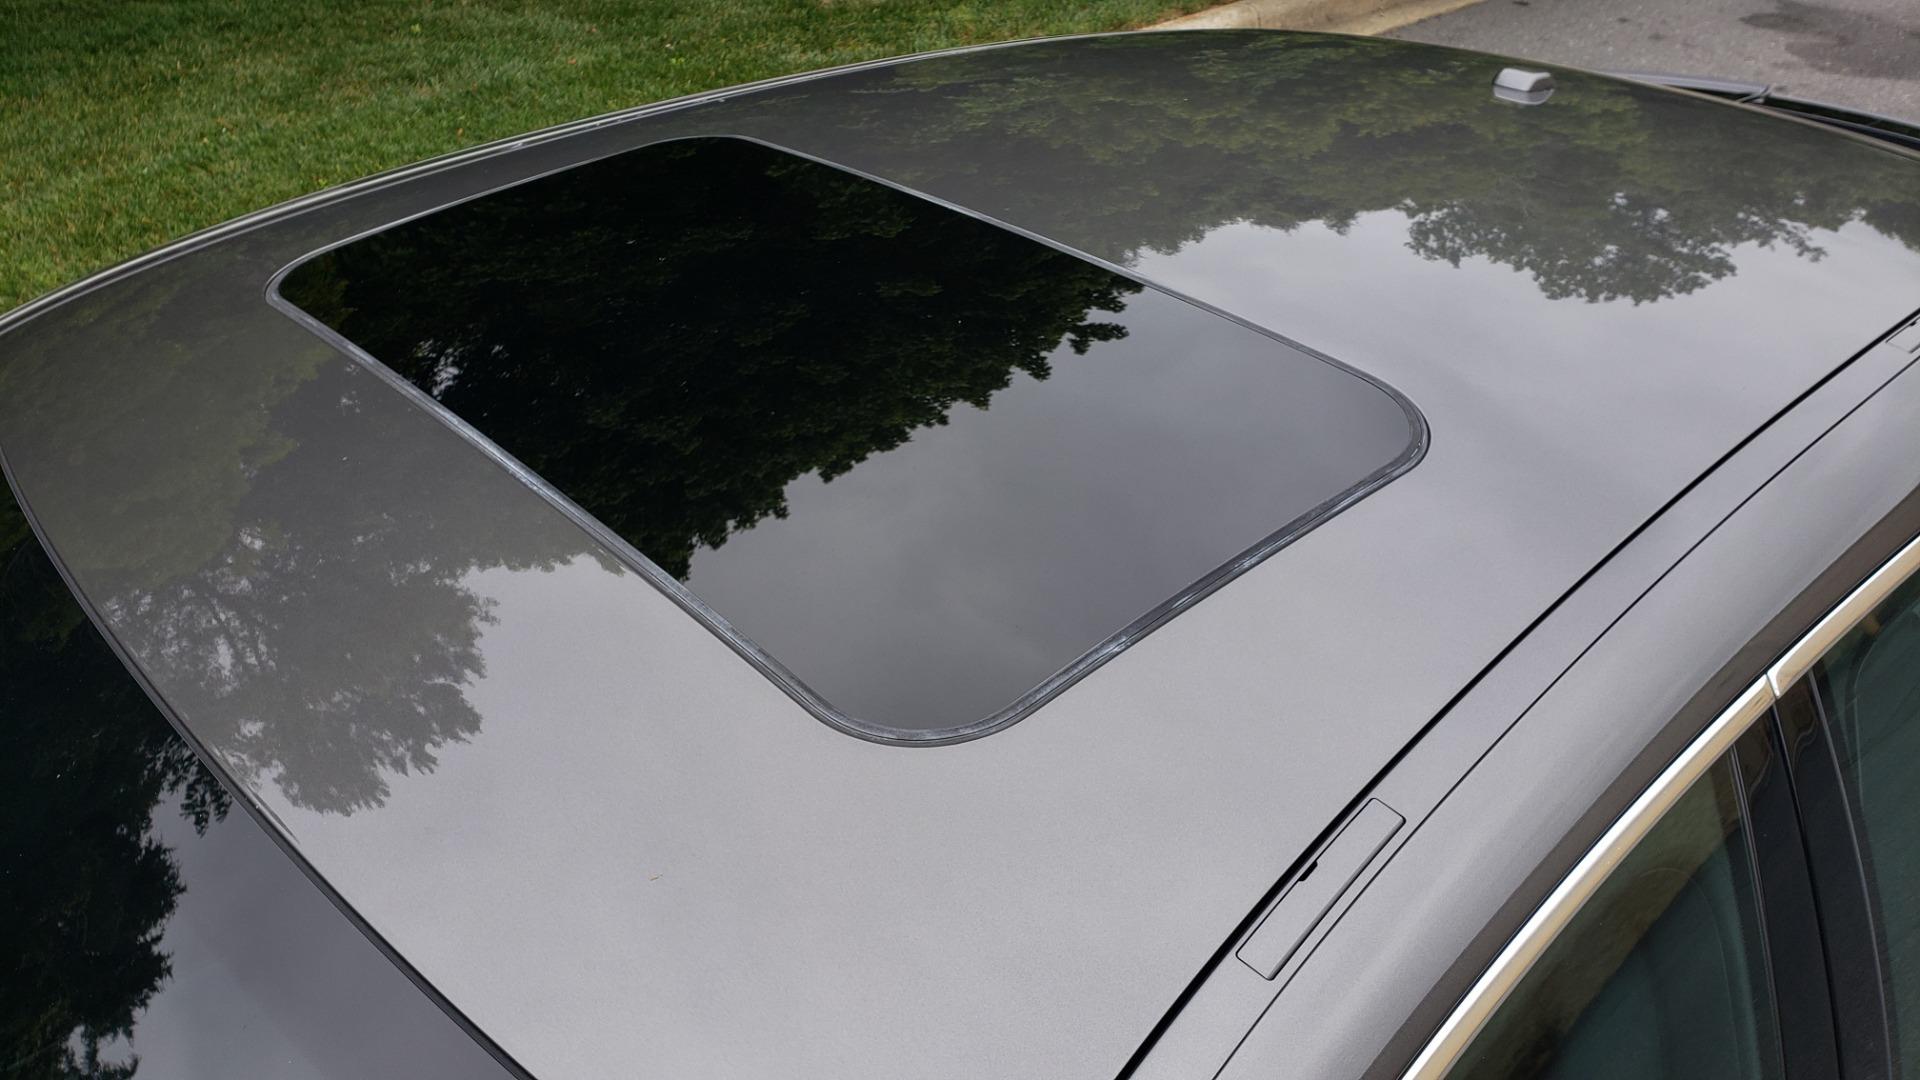 Used 2013 Porsche PANAMERA TURBO 4.8L V8 / AWD / NAV / SUNROOF / LCA / PARK ASST / BURMESTER for sale $45,995 at Formula Imports in Charlotte NC 28227 8